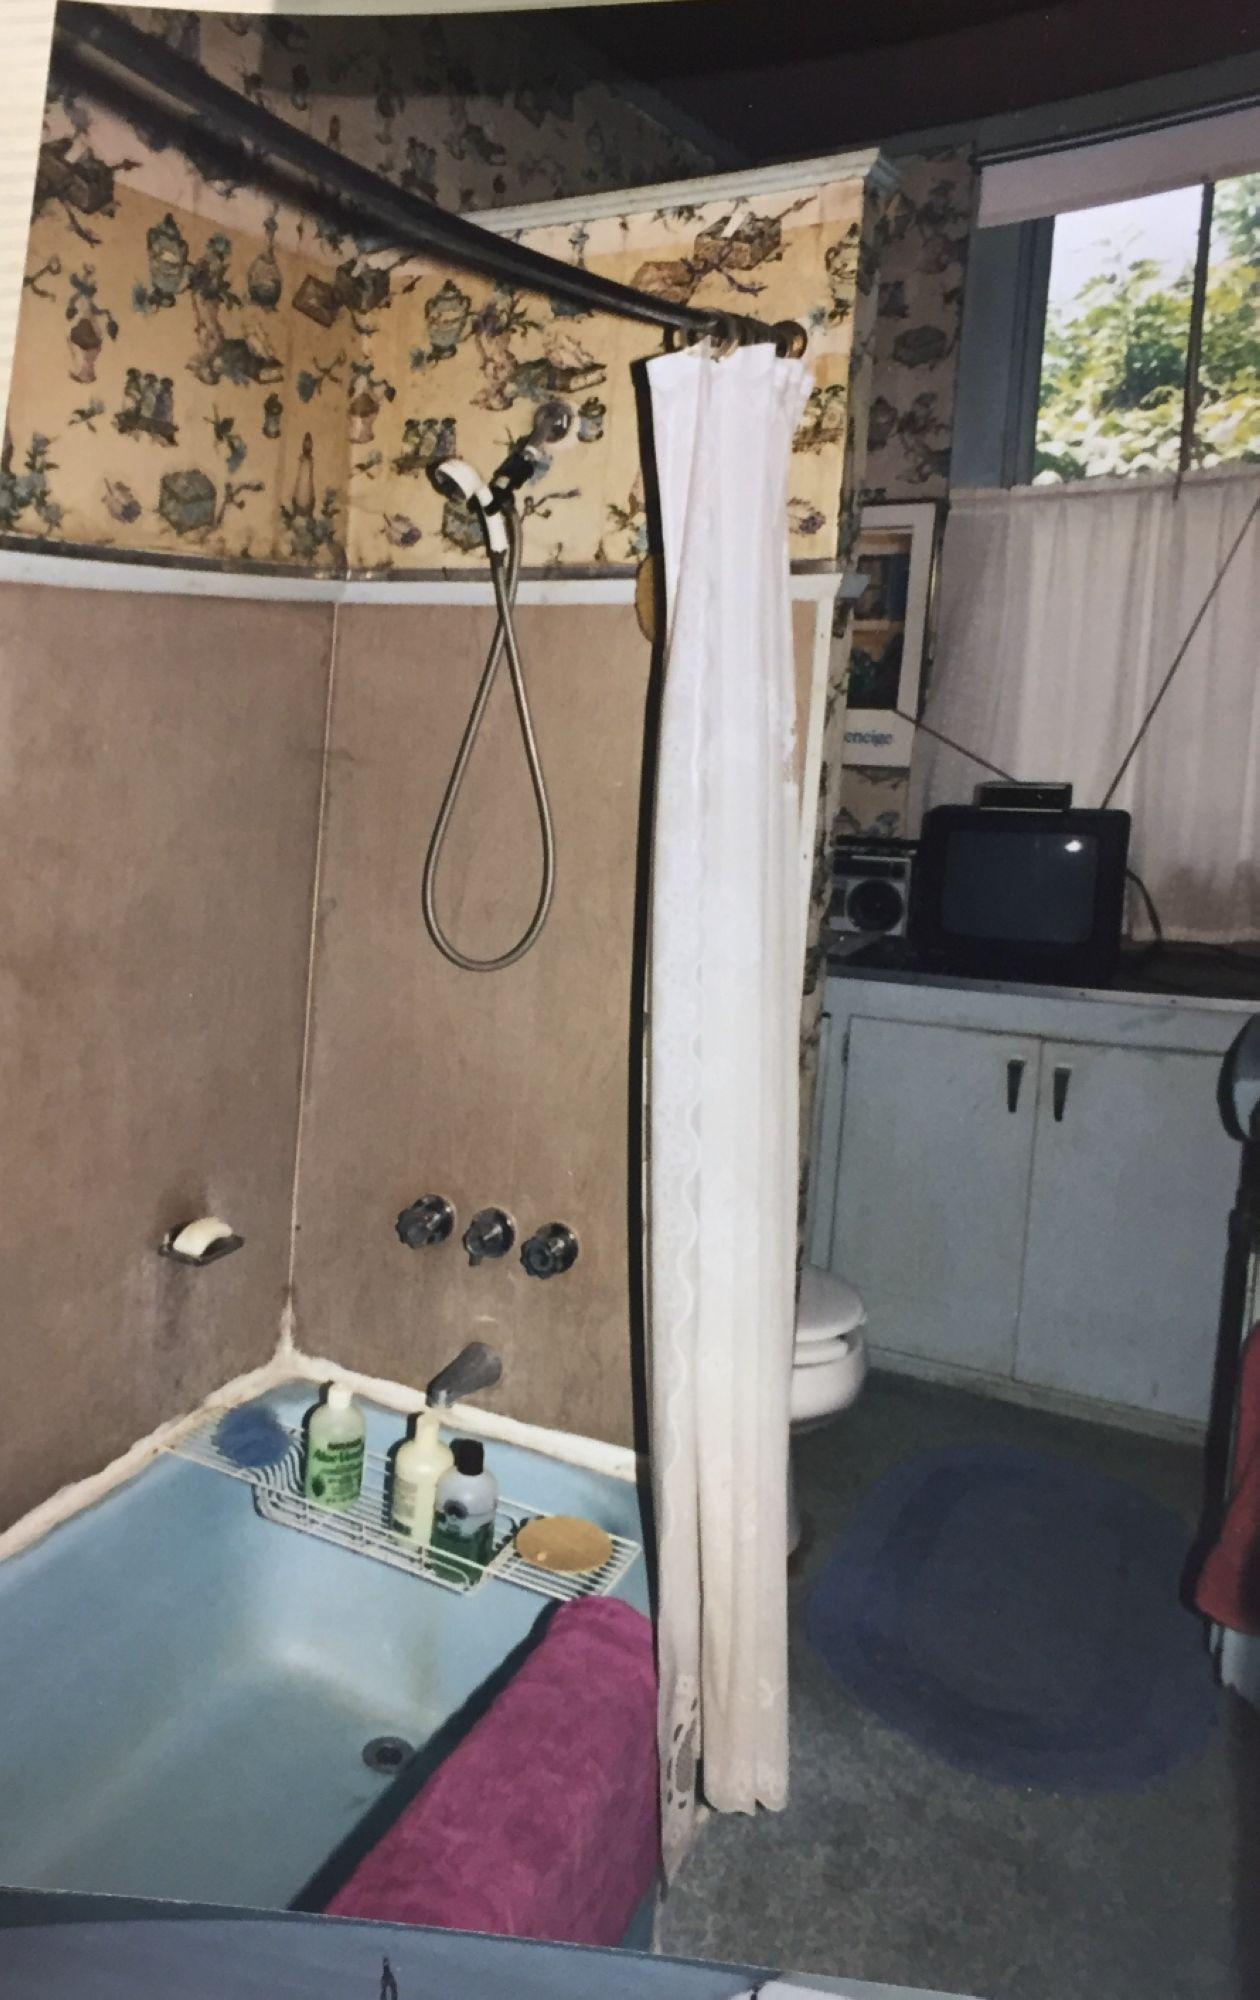 07-Adams-childhood-bathroom.jpg